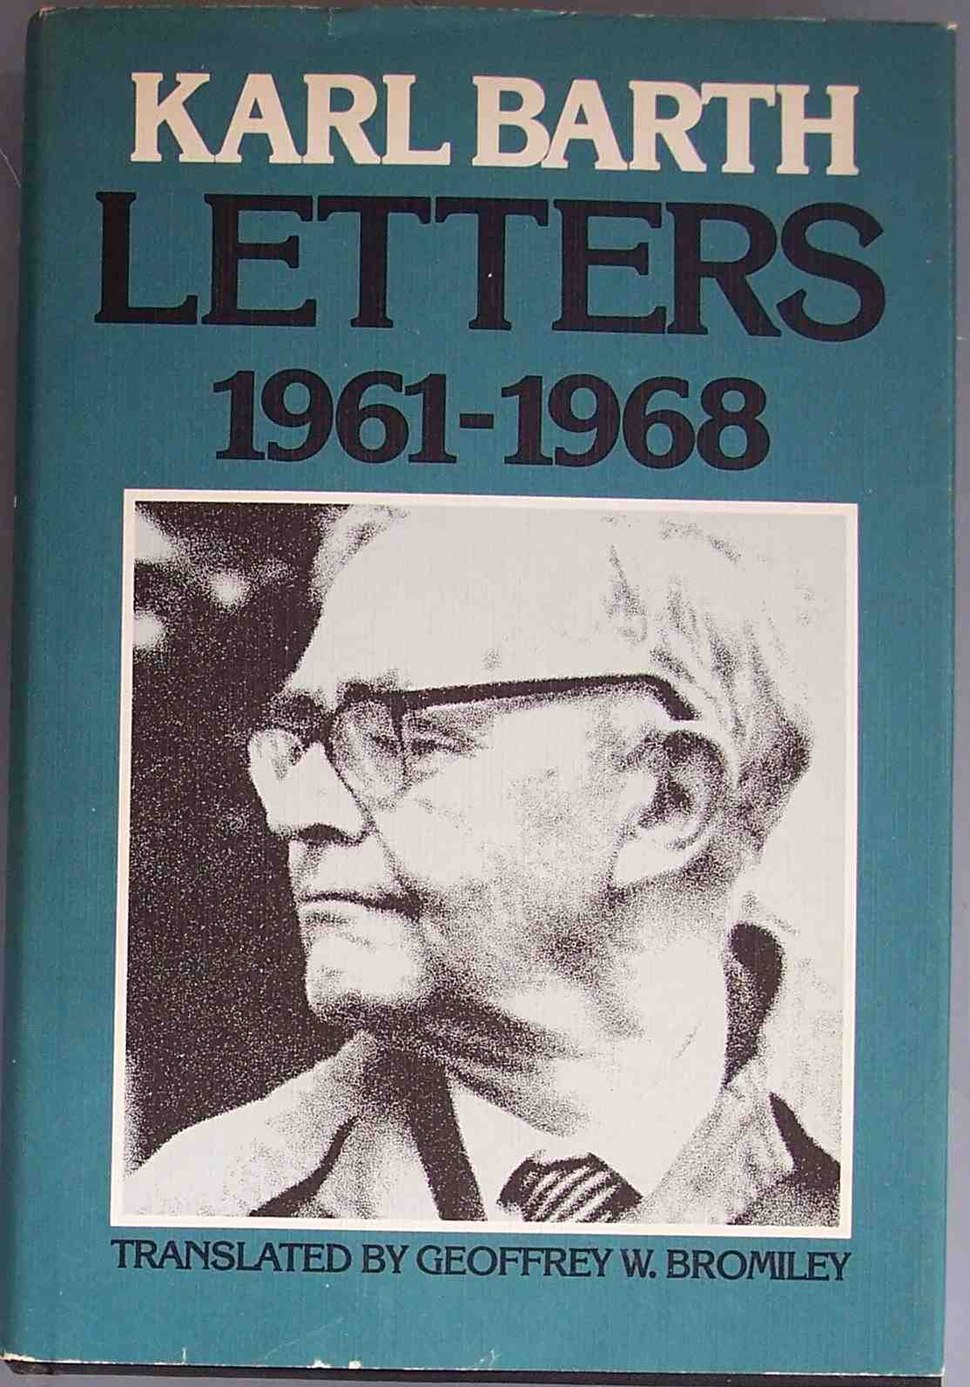 Karl Barth Letters 1961-1968